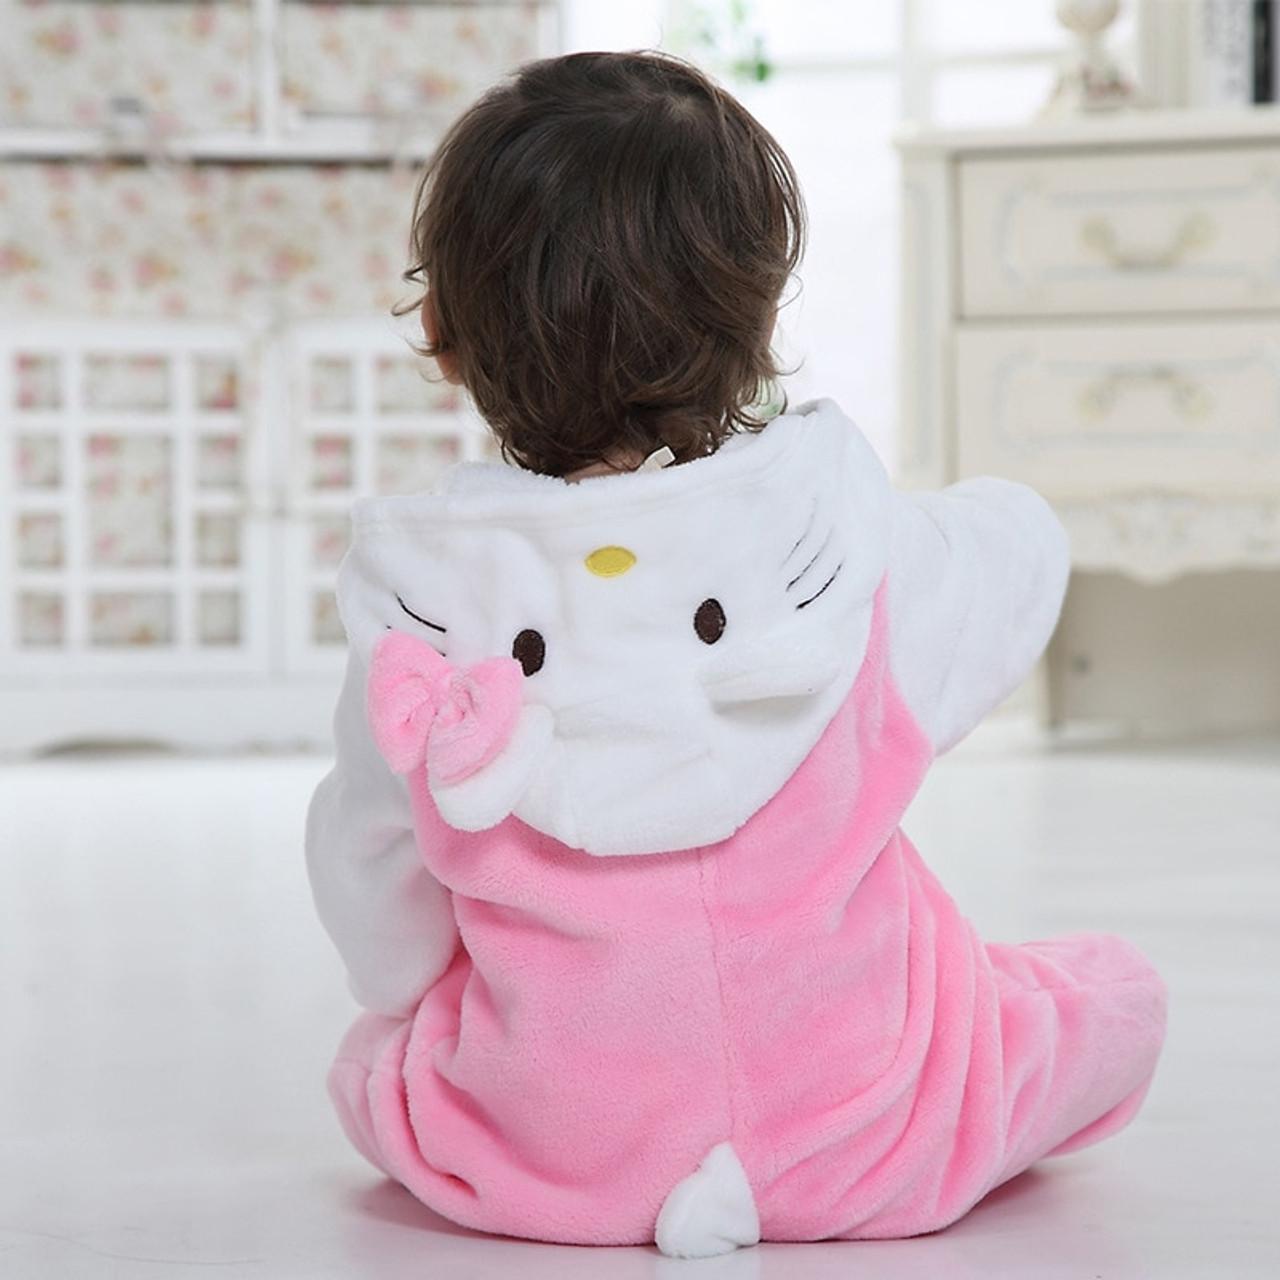 671ed85fe ... Hooded Baby Romper Infant Jumpsuit Toddler Onesie for 0-3 Years Baby  Boys Girls Pikachu